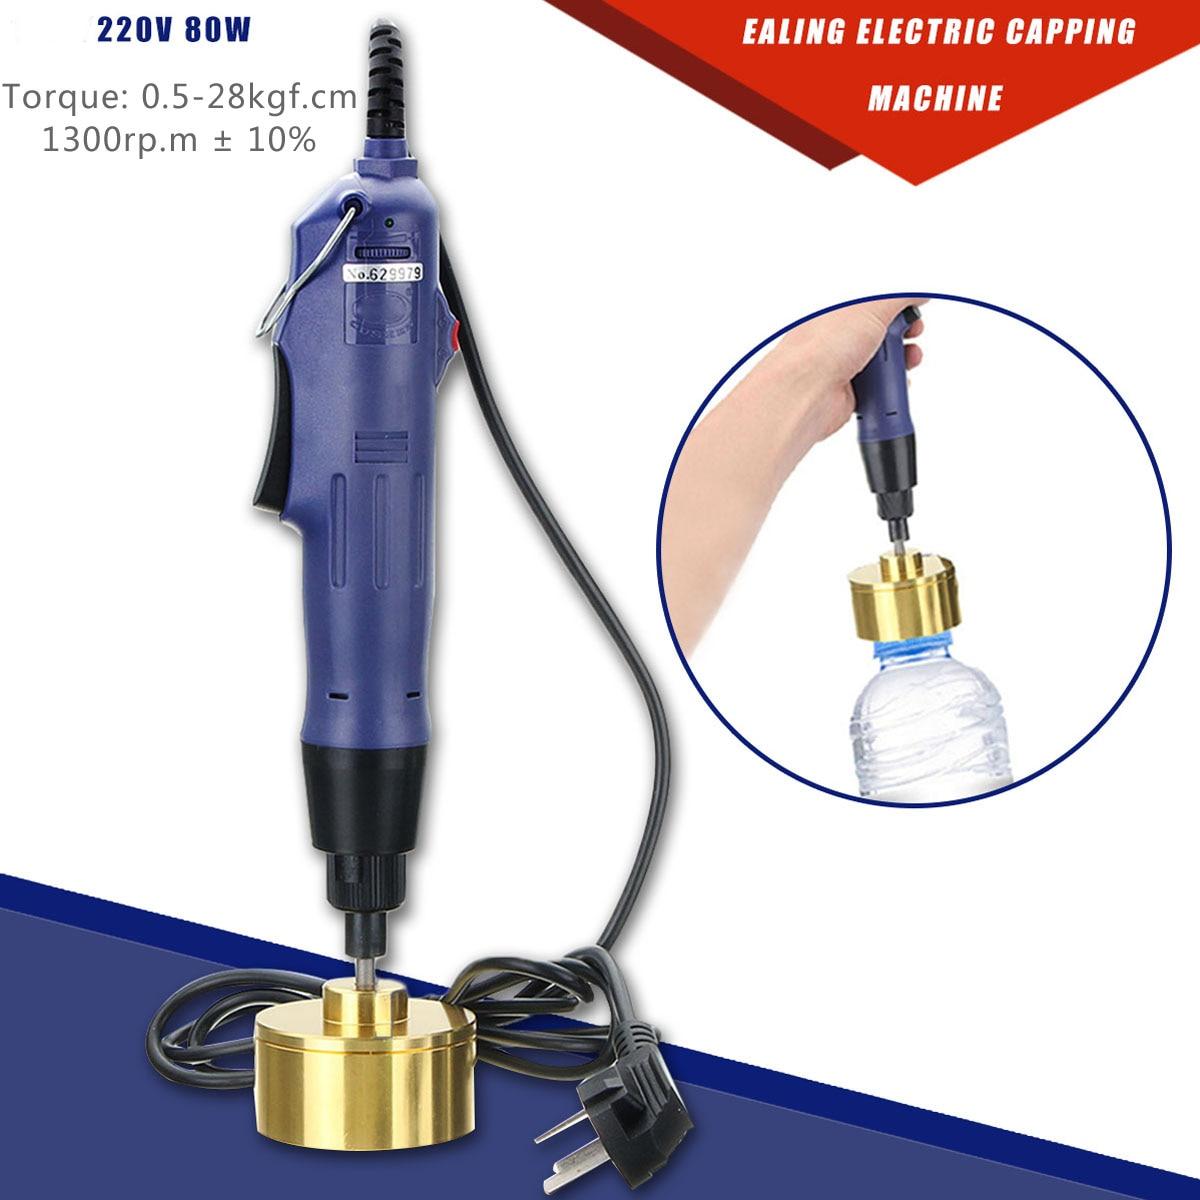 WARMTOO 10Pcs 80W Electric Bottle Capping Machine Manual Cap Sealing Sealer Machine 220V